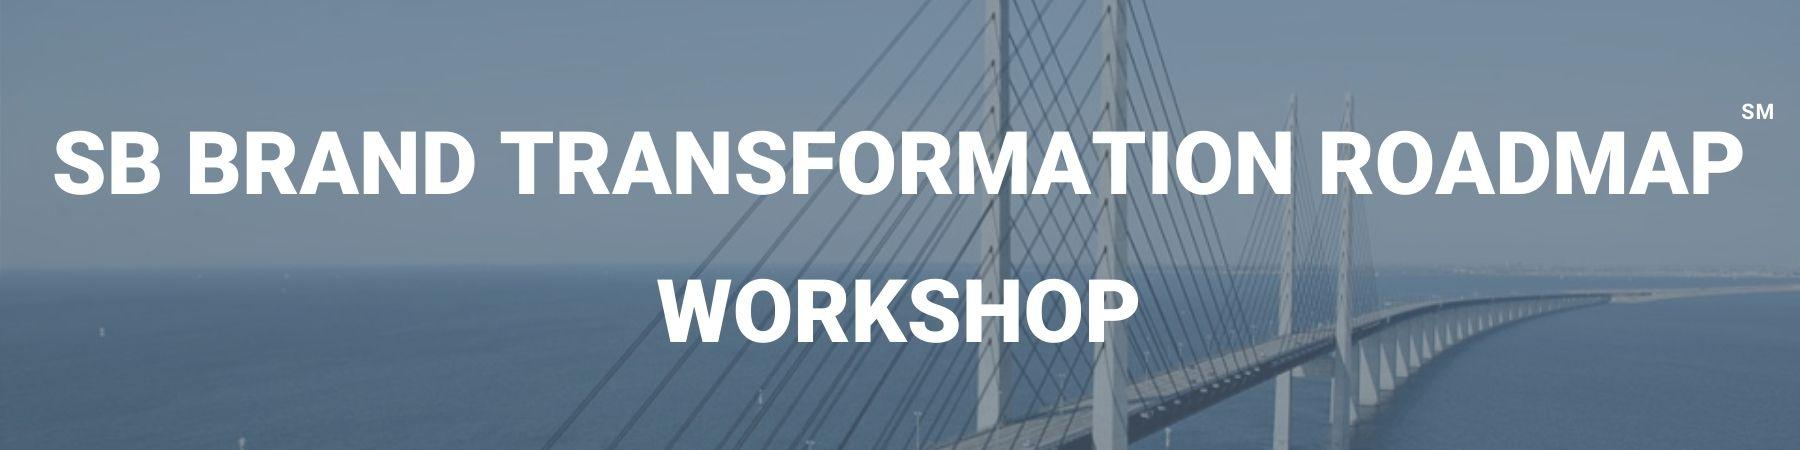 SB Brand Transformation Roadmap Workshop